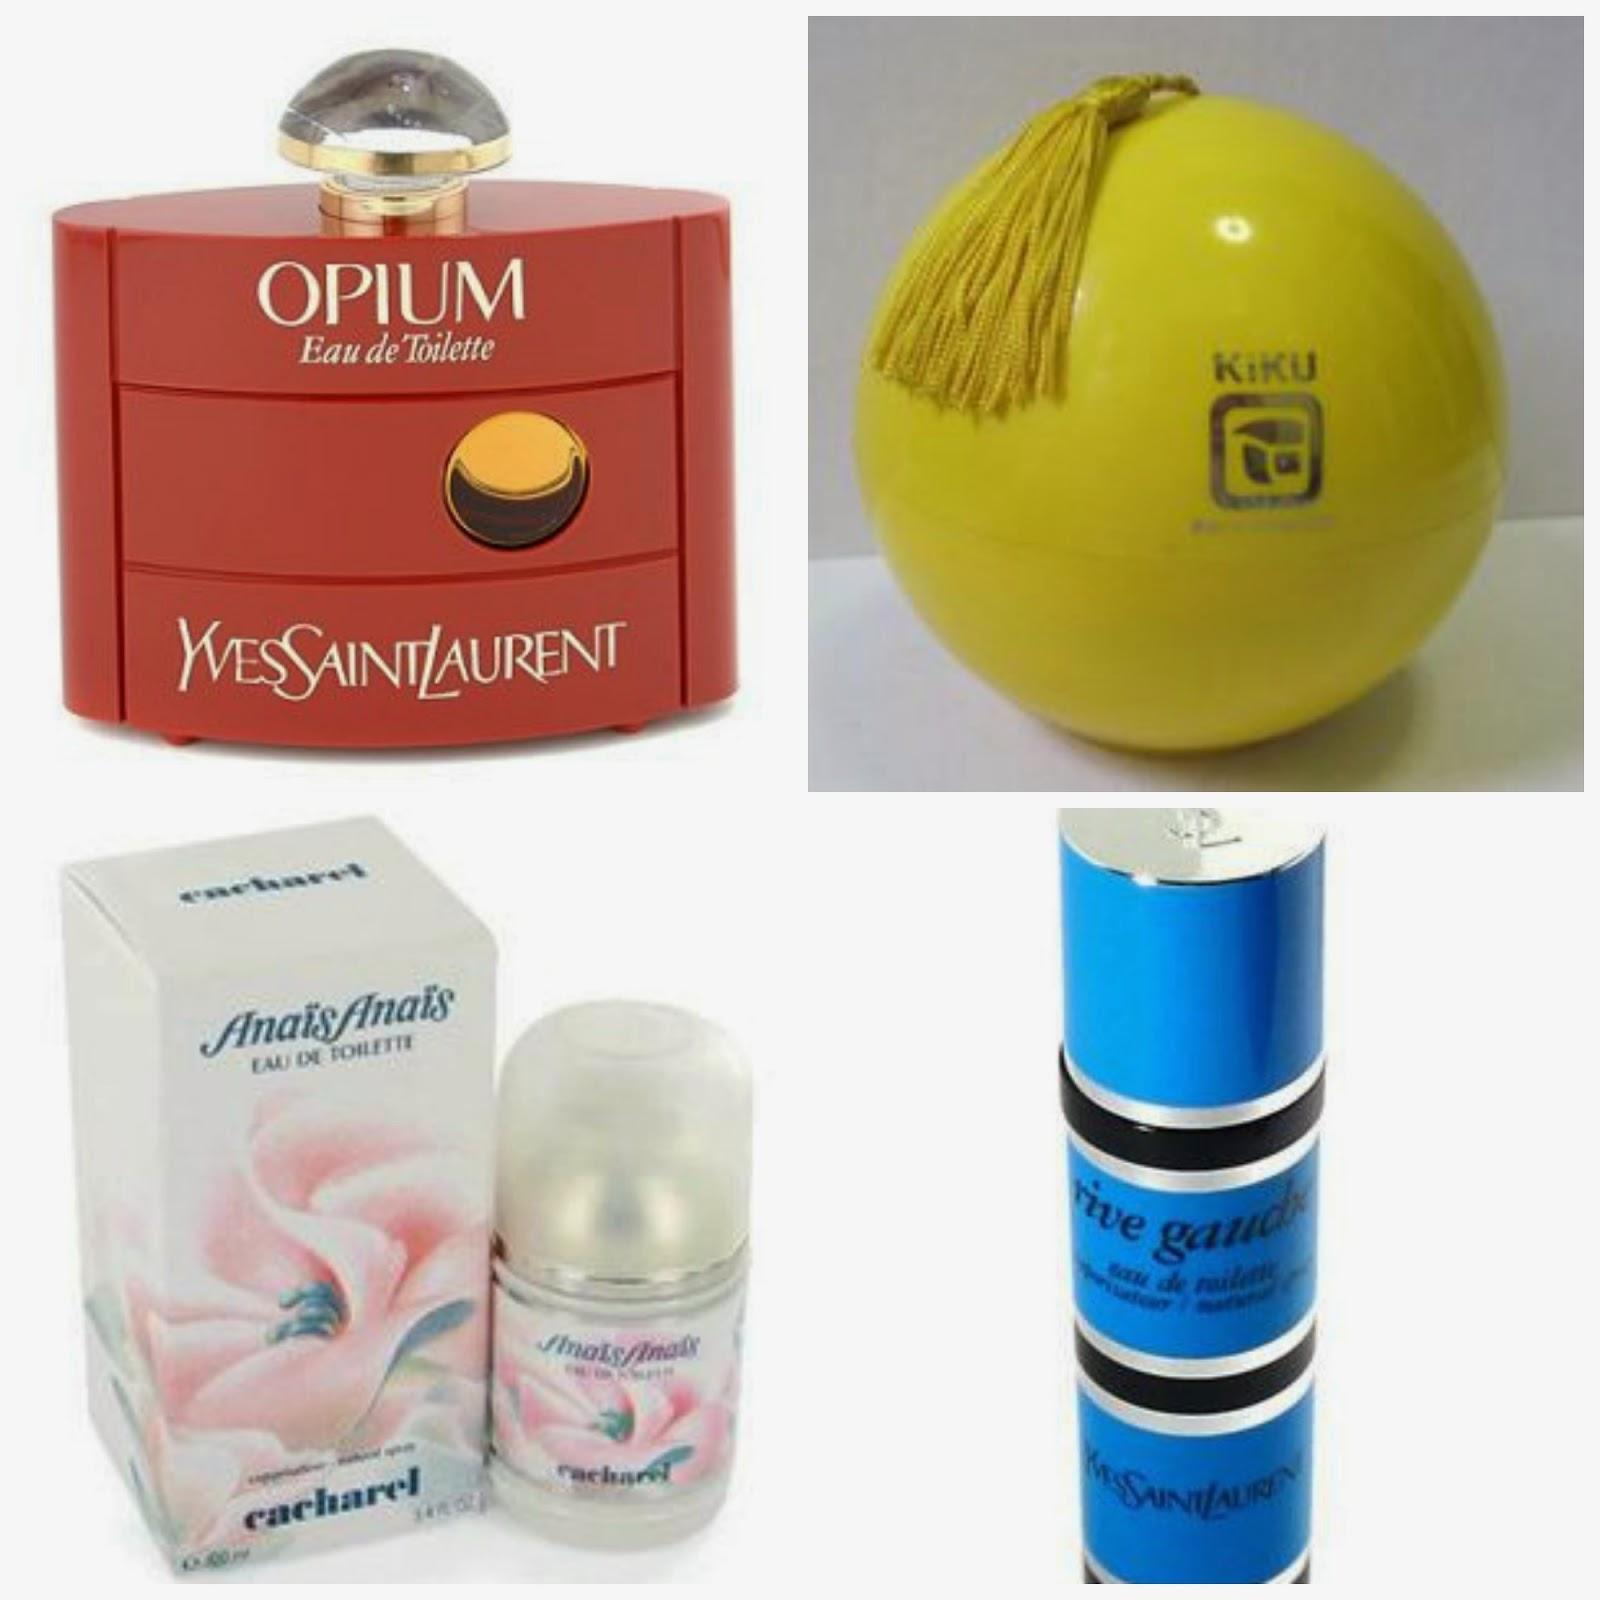 Seventies perfume